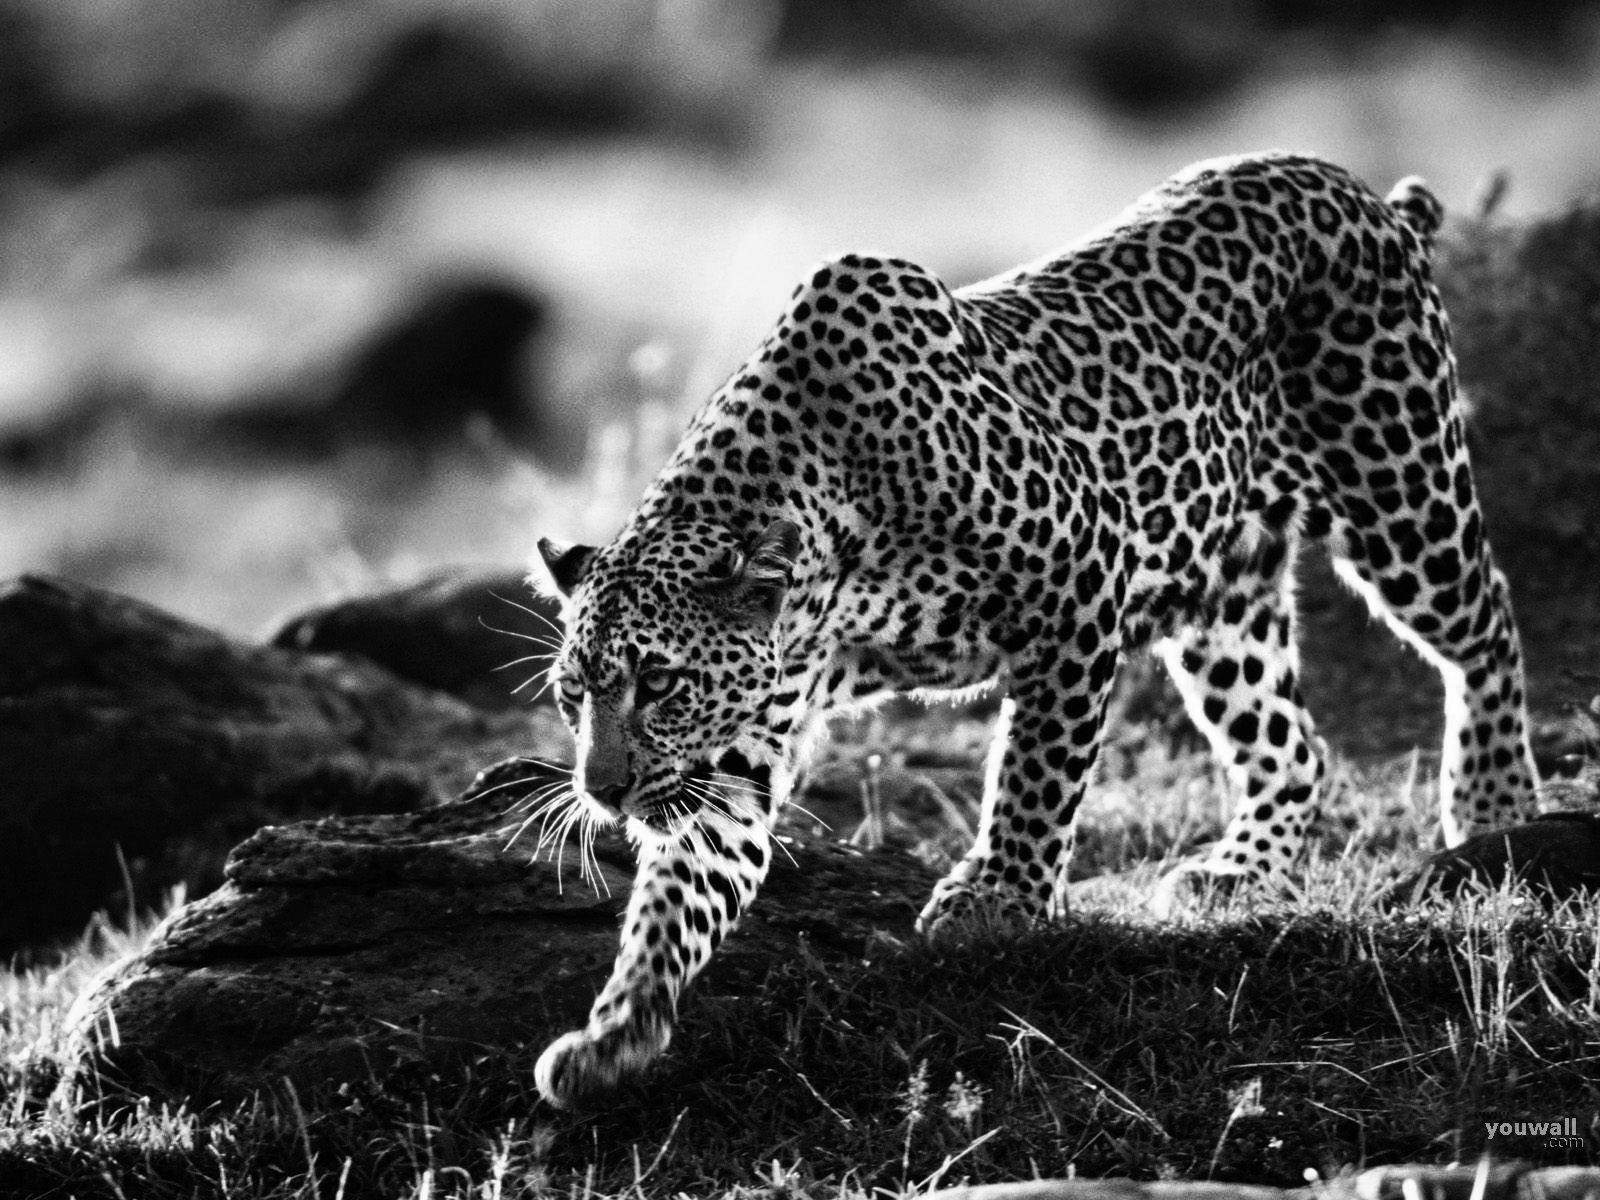 Black and white cheetah wallpaper Group 52 1600x1200